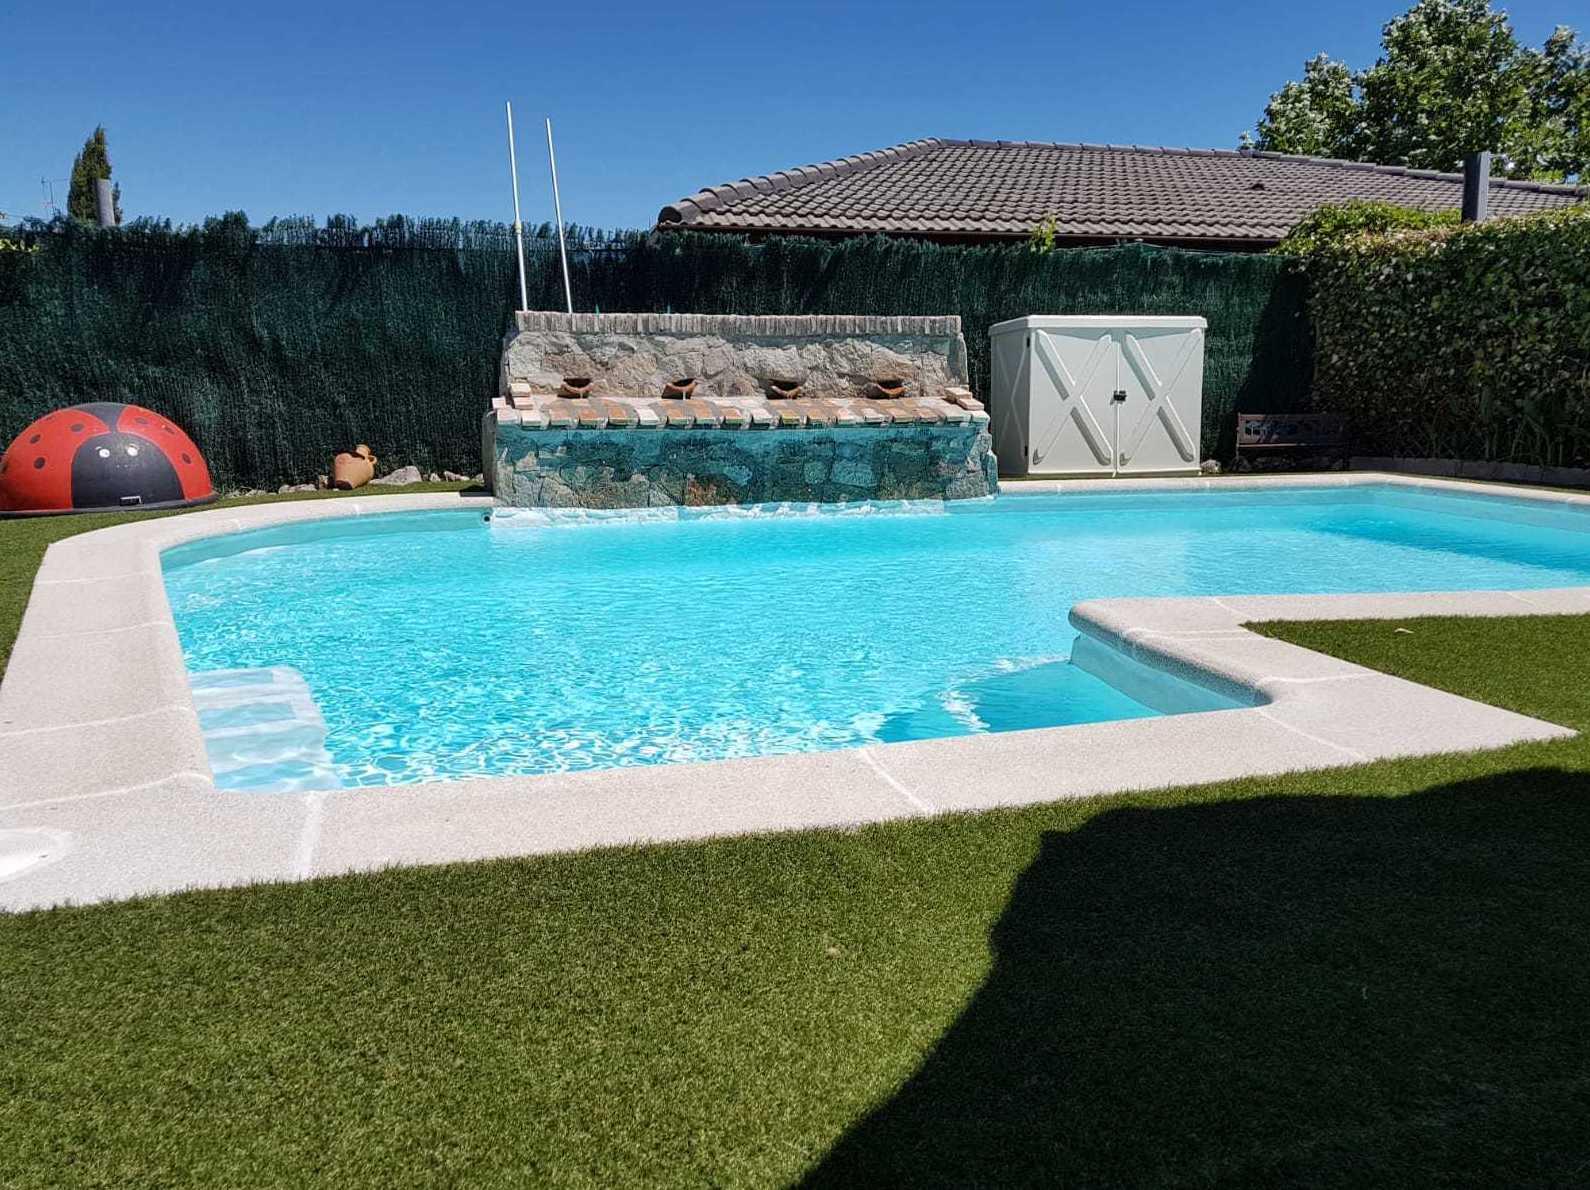 Foto 11 de Instalación de piscinas en Leganés | Lallana Pol